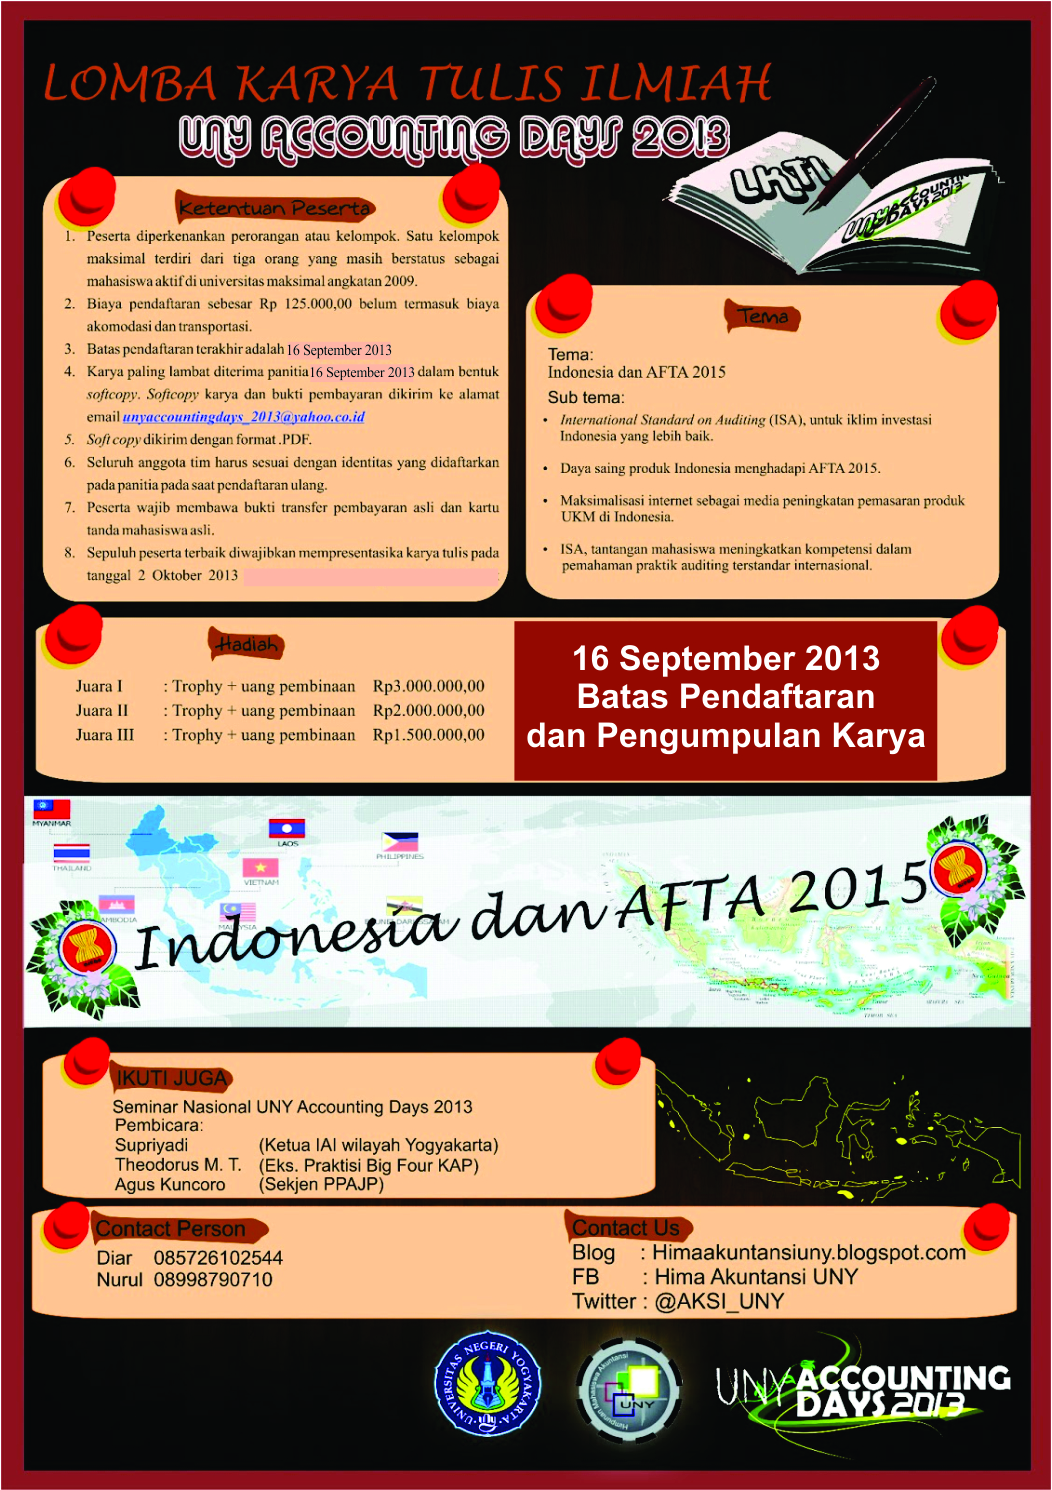 Jadwal Lomba Karya Tulis Ilmiah UNY Accounting Days 2013 Yogyakarta